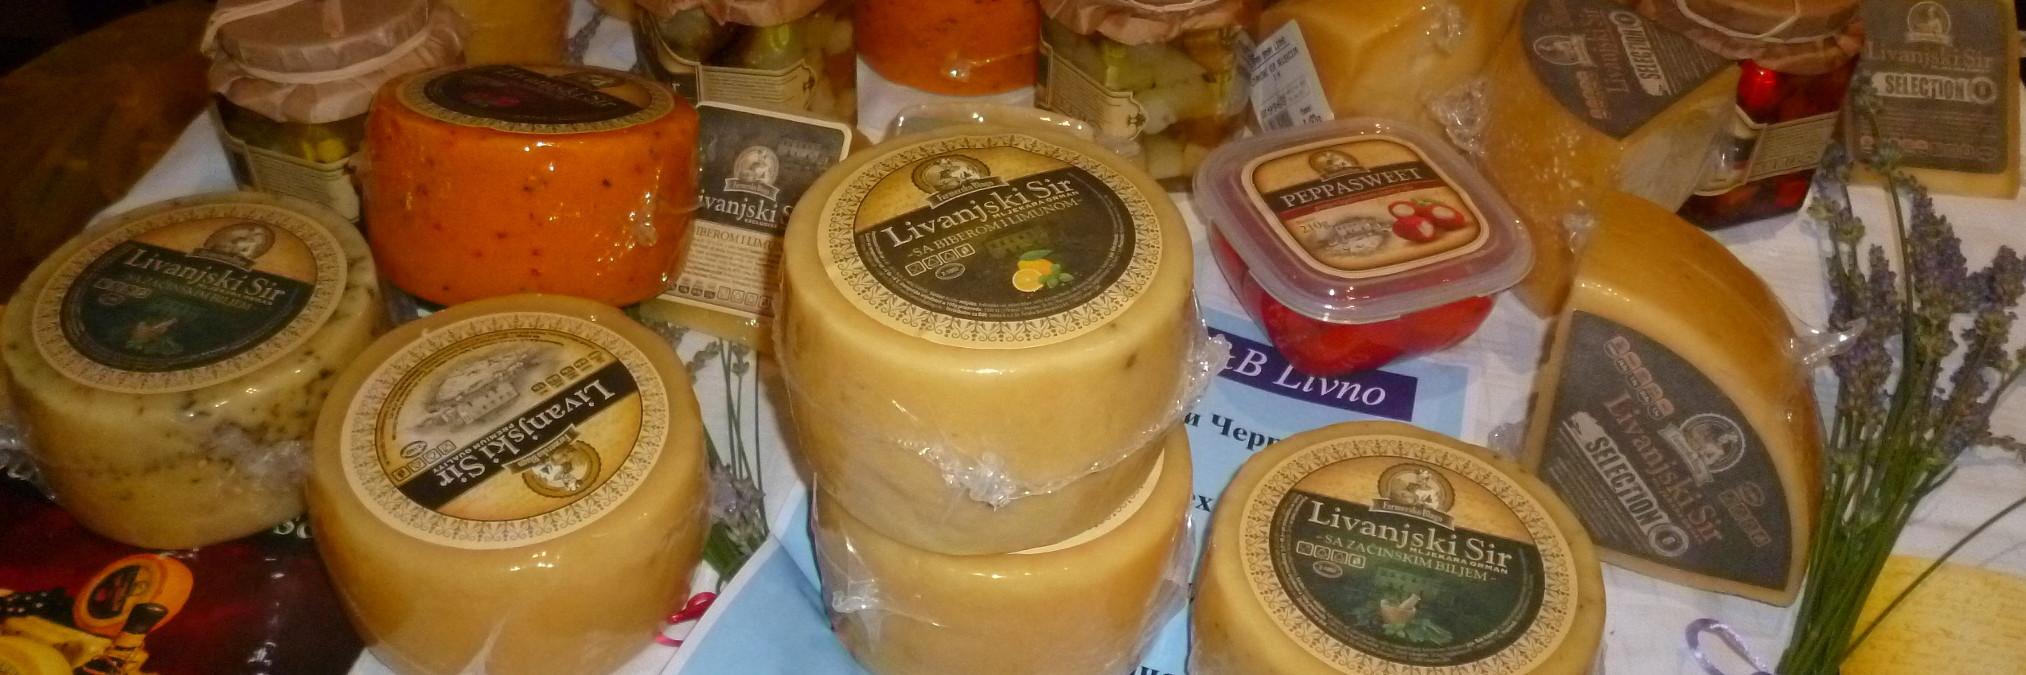 Ливаньский сыр